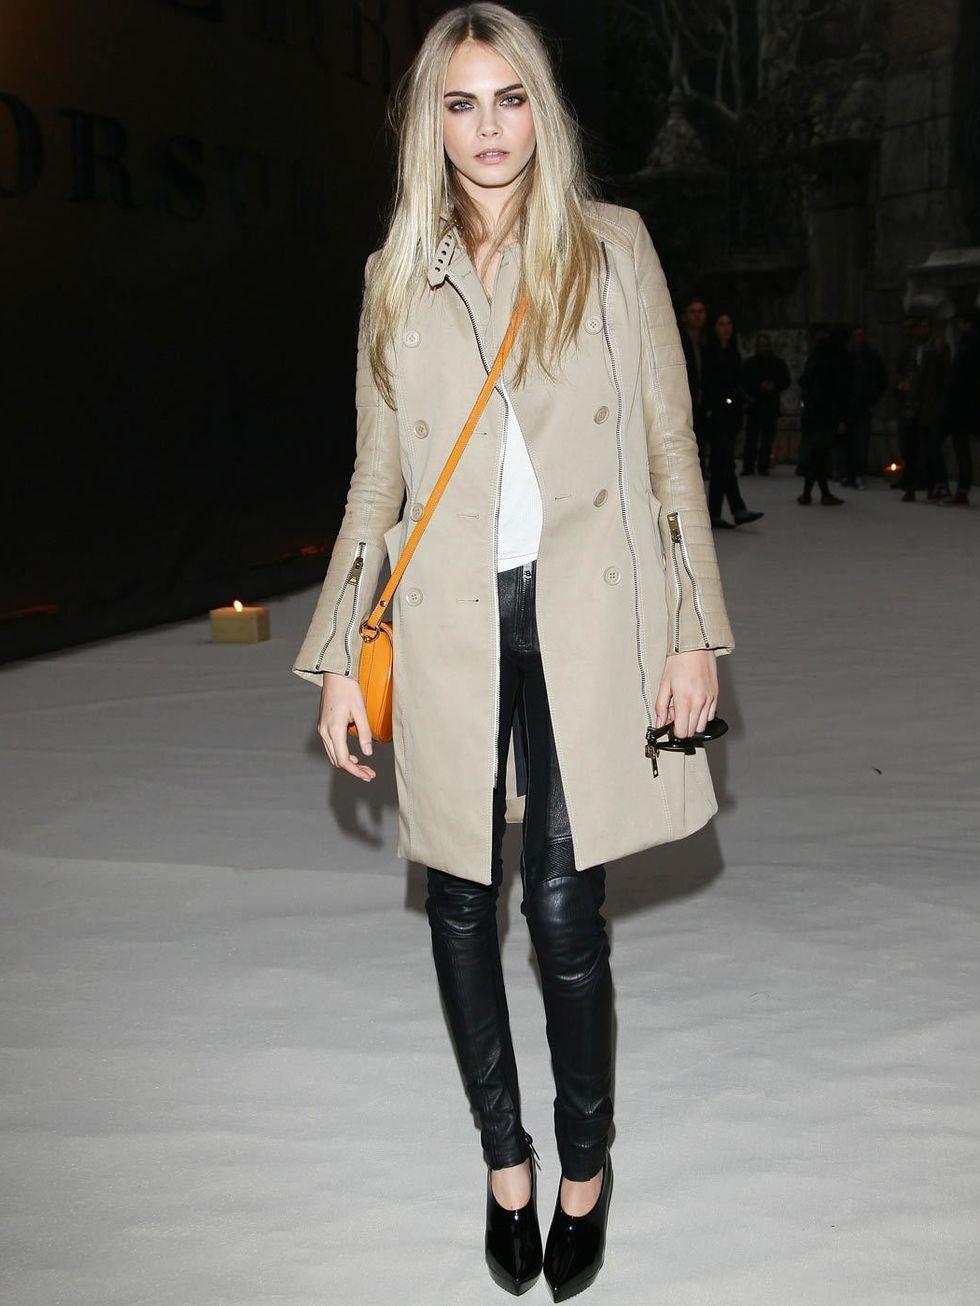 A Fashionable Life Sean Fox Zastoupil Cara Delevingne Fashion Icon